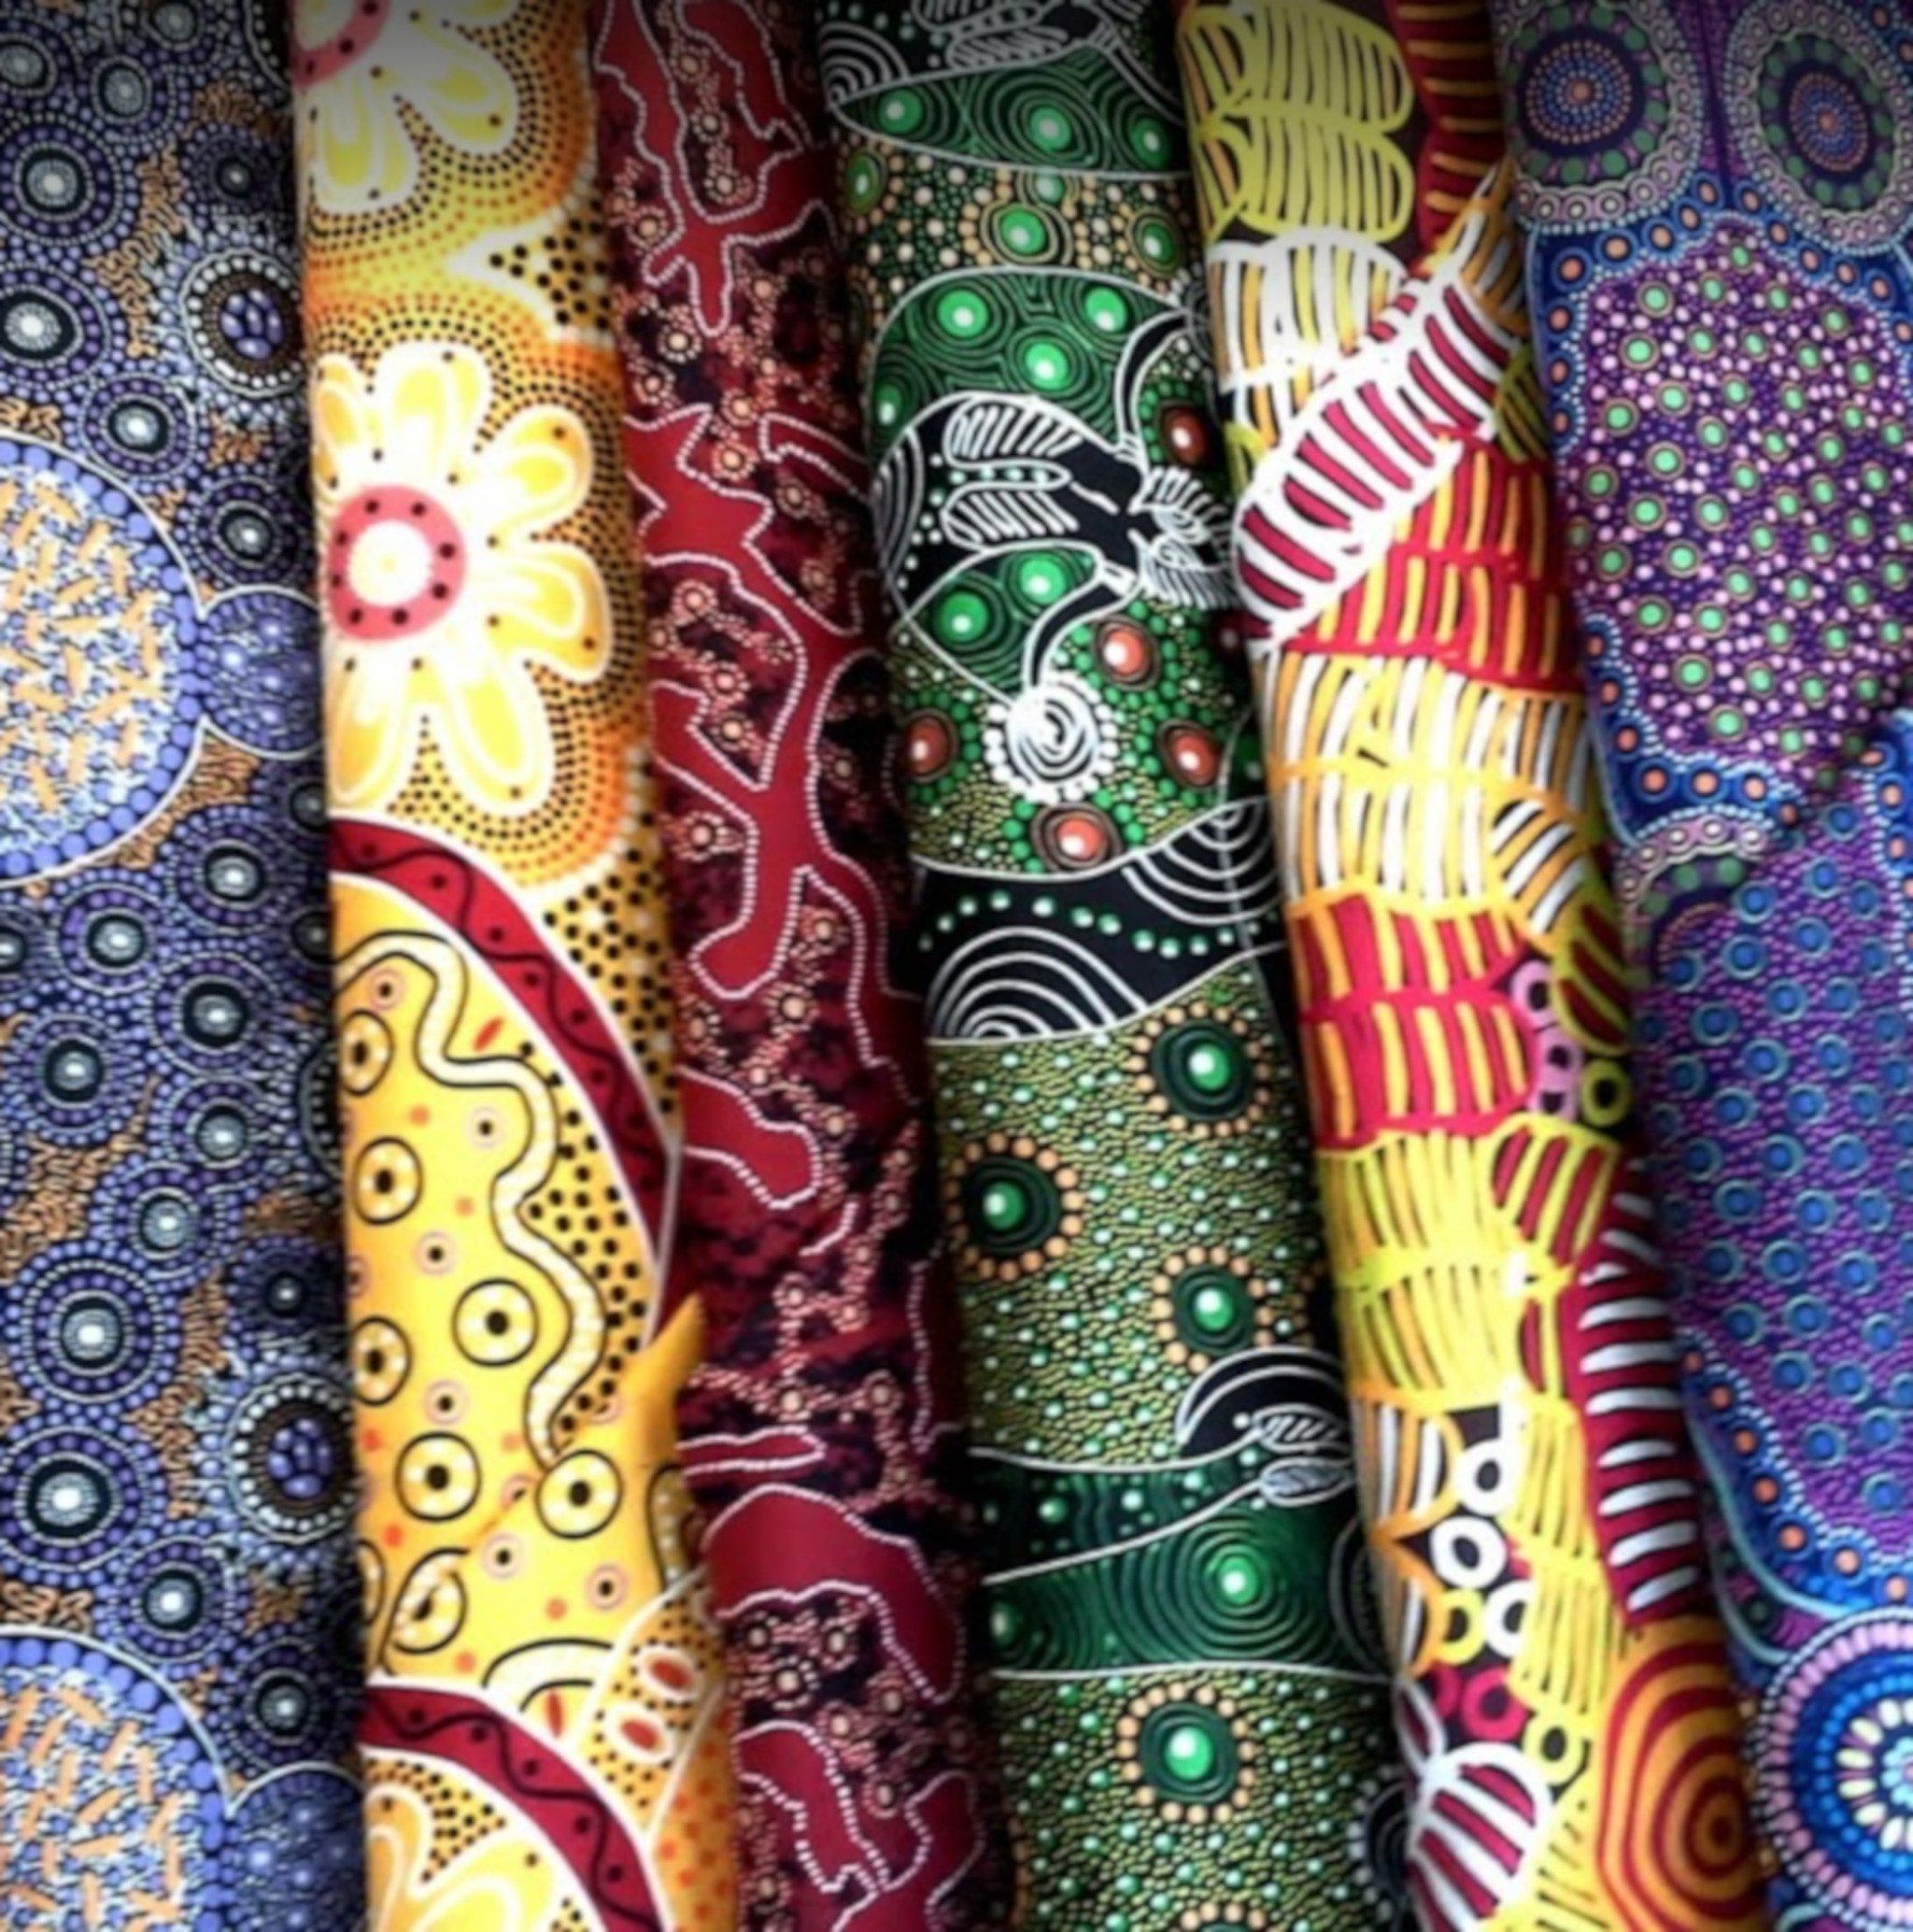 Aboriginal Fabrics, textiles, fabrics, Aboriginal Art, Alice Springs, Fabric Shop